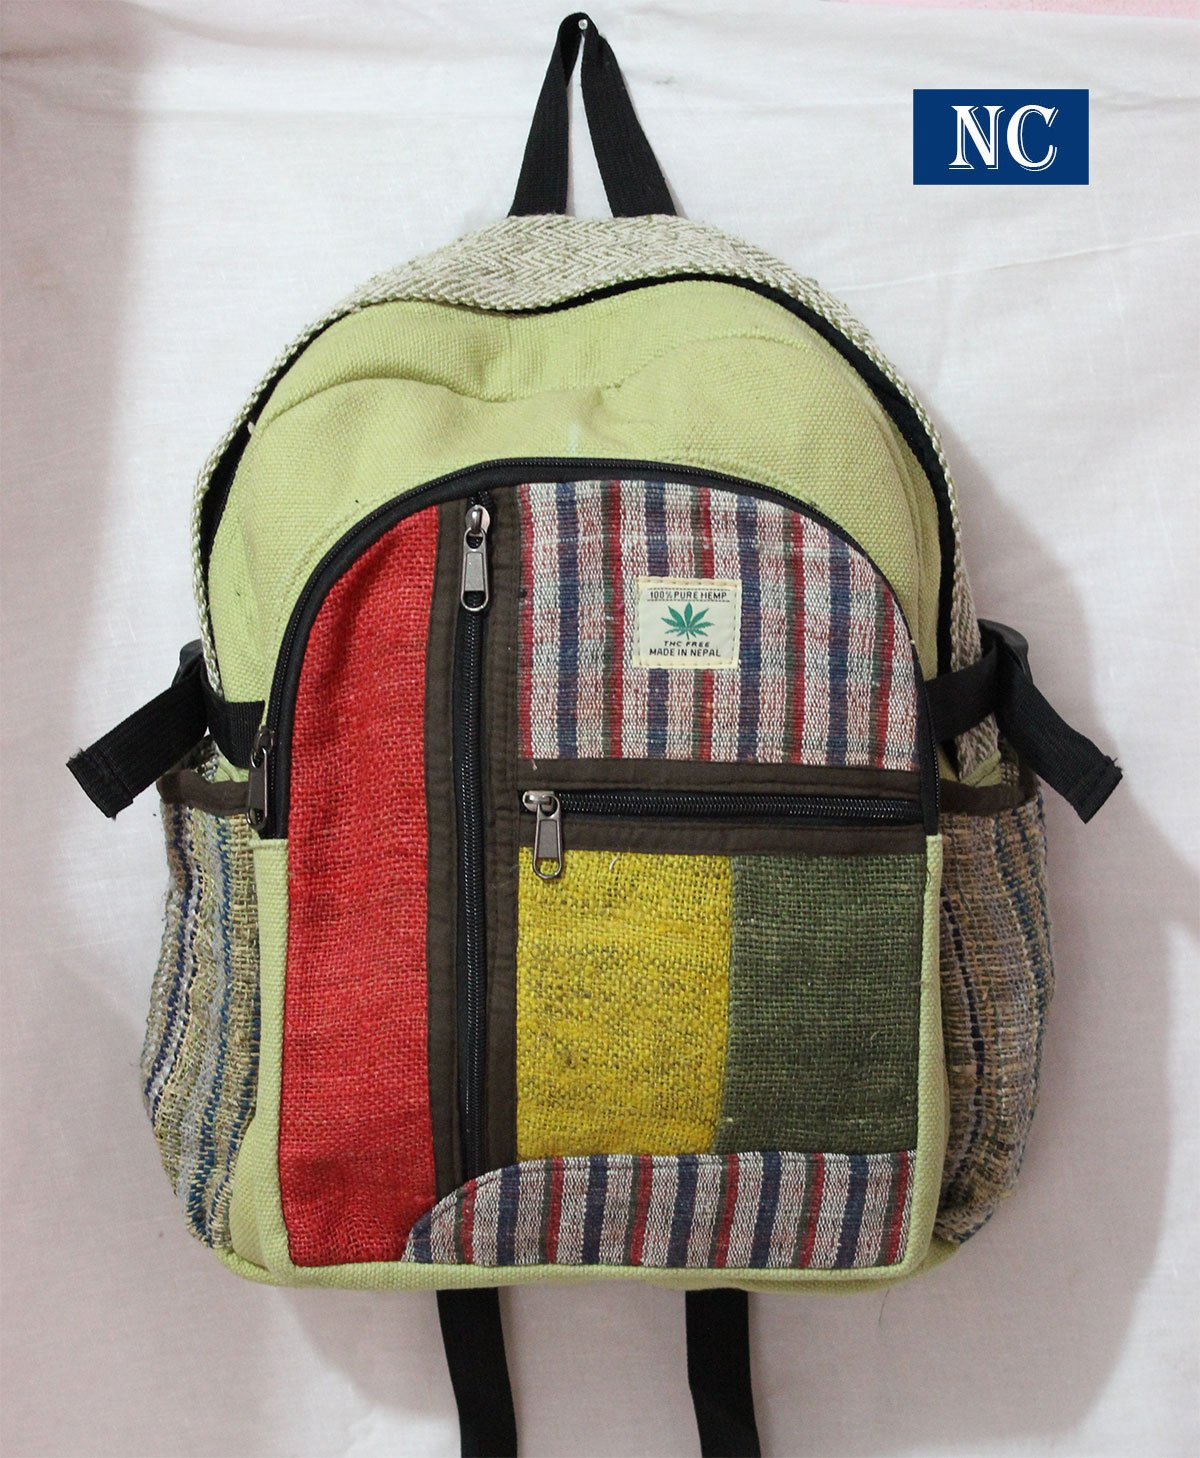 Nepalés hecho a mano cáñamo Rasta - Mochila de cáñamo 100% Pure (sin THC) mochila hecho a mano en Nepal con funda para portátil - diseño de moda viaje ...